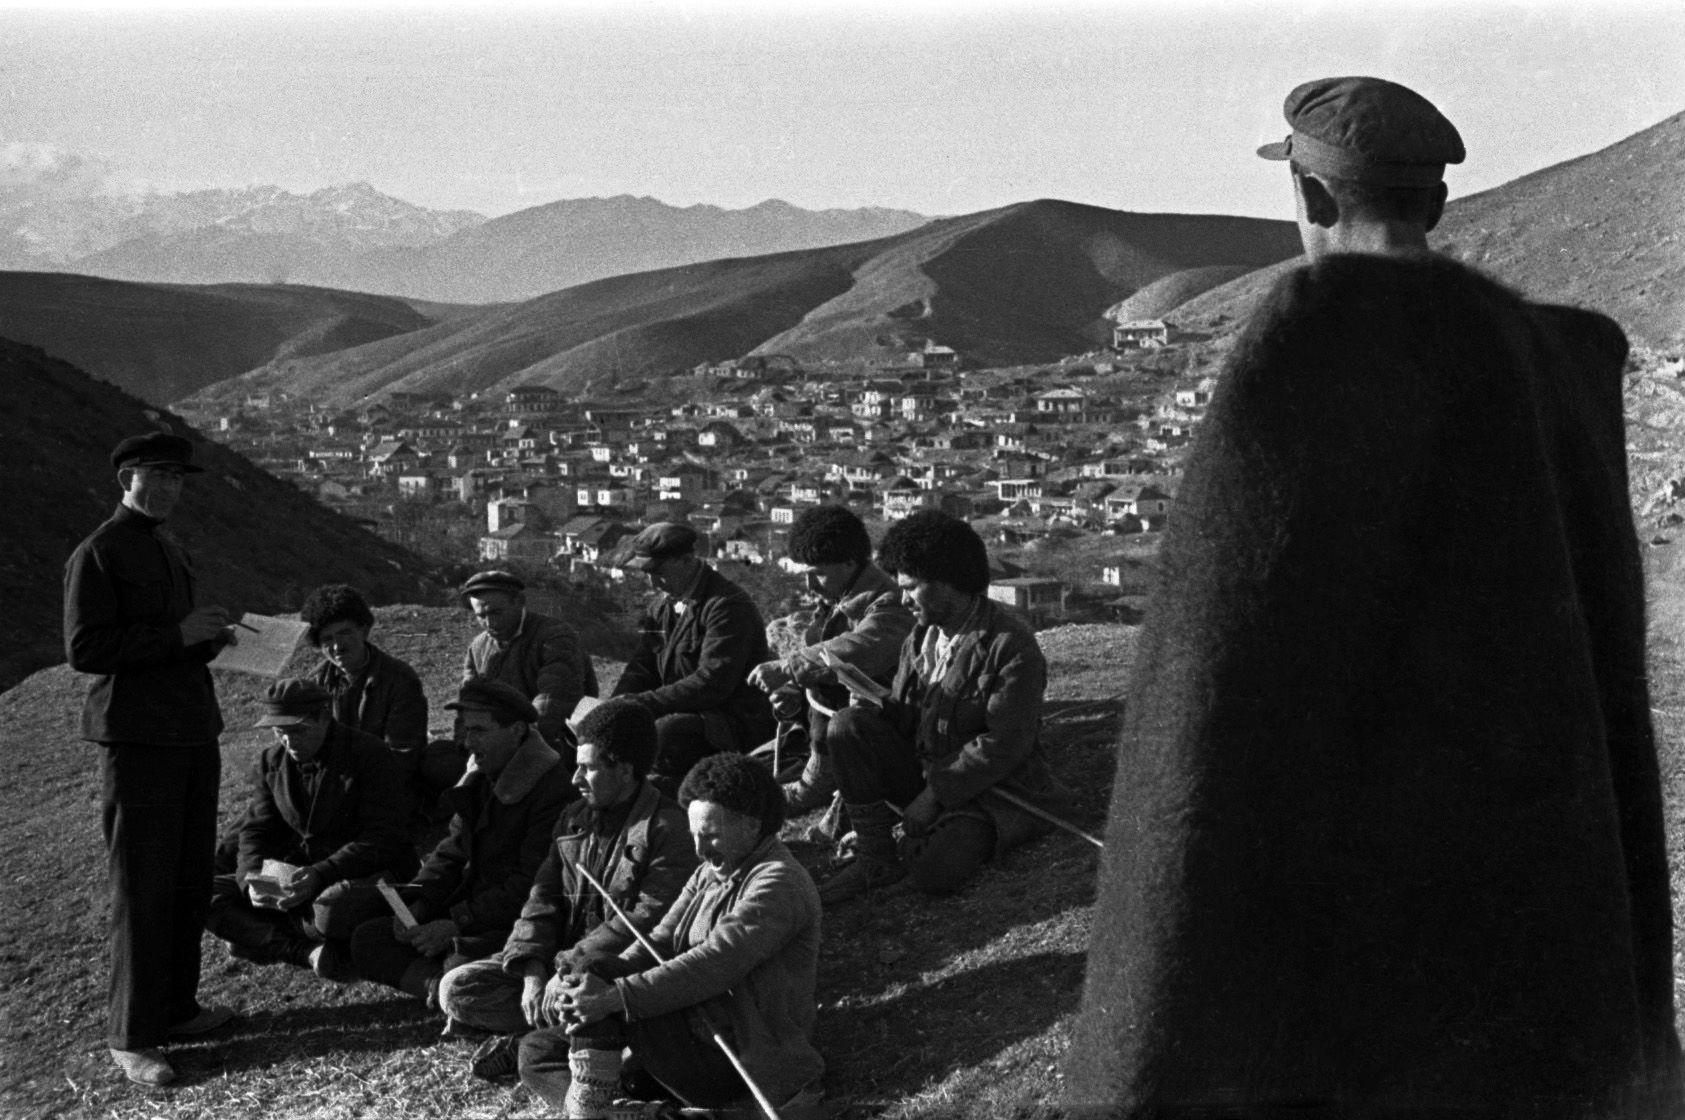 Morning meeting, 1938. Shepherds. Savan district, Armenia